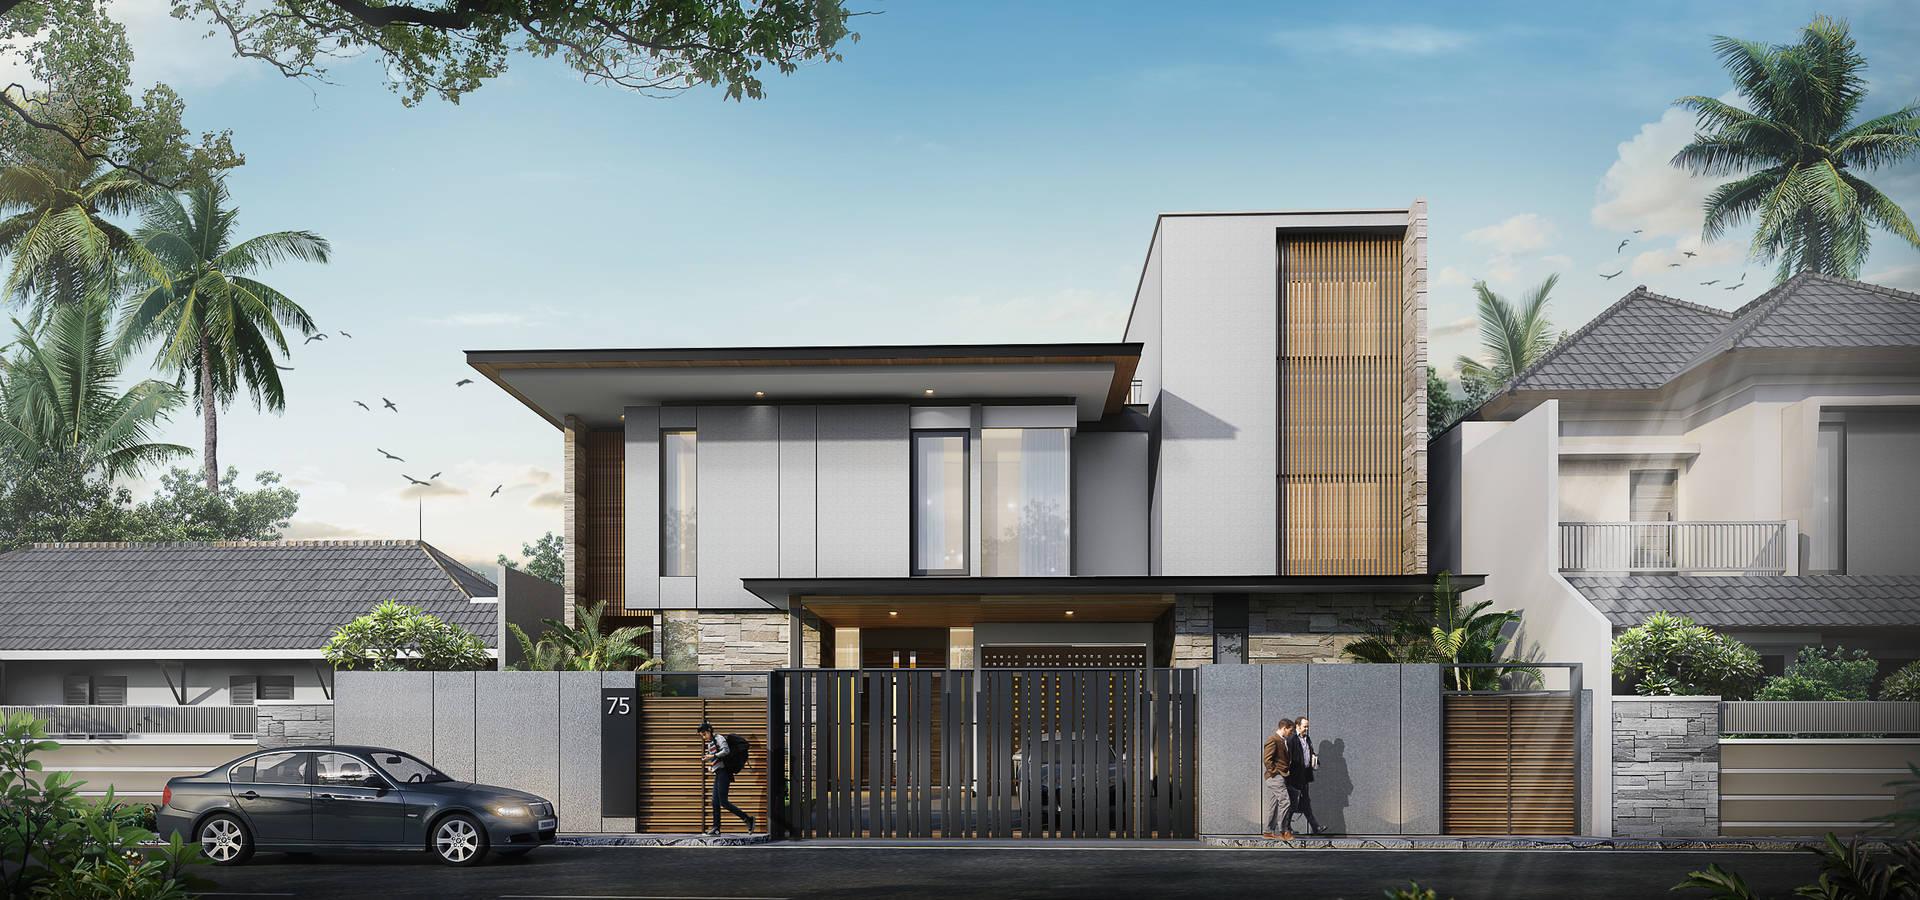 Baskara Design and Planning